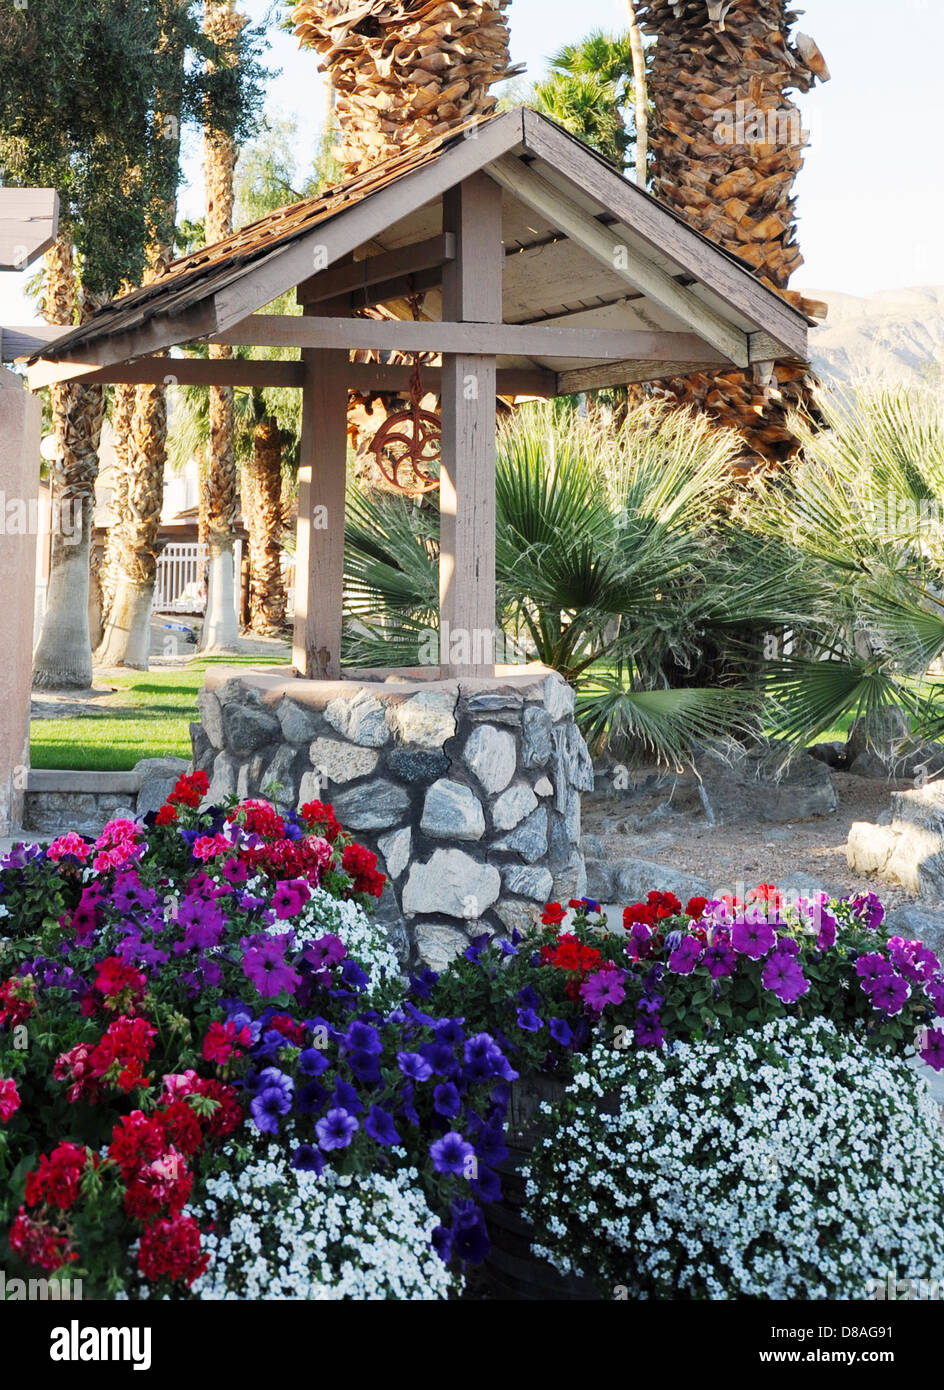 Flowers Surround Wishing Well In Desert Hot Springs California Stock